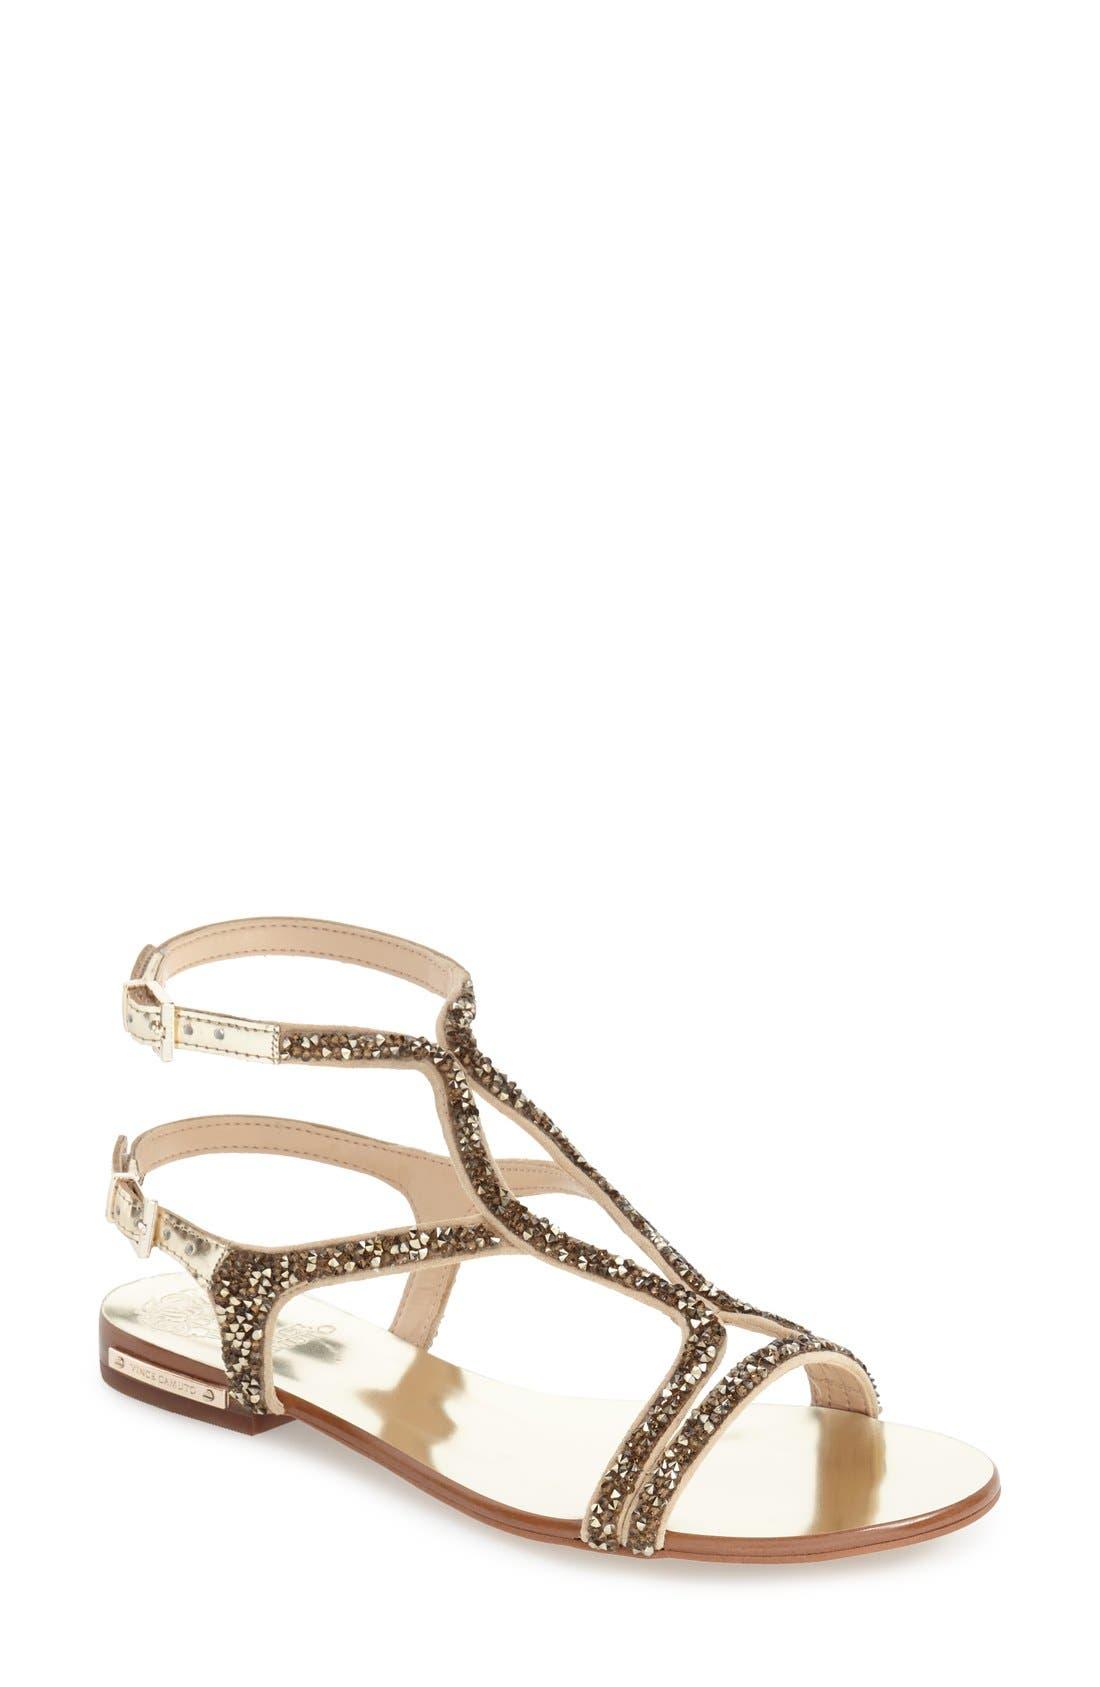 Alternate Image 1 Selected - Vince Camuto 'Jacinta' Ankle Strap Sandal (Women)